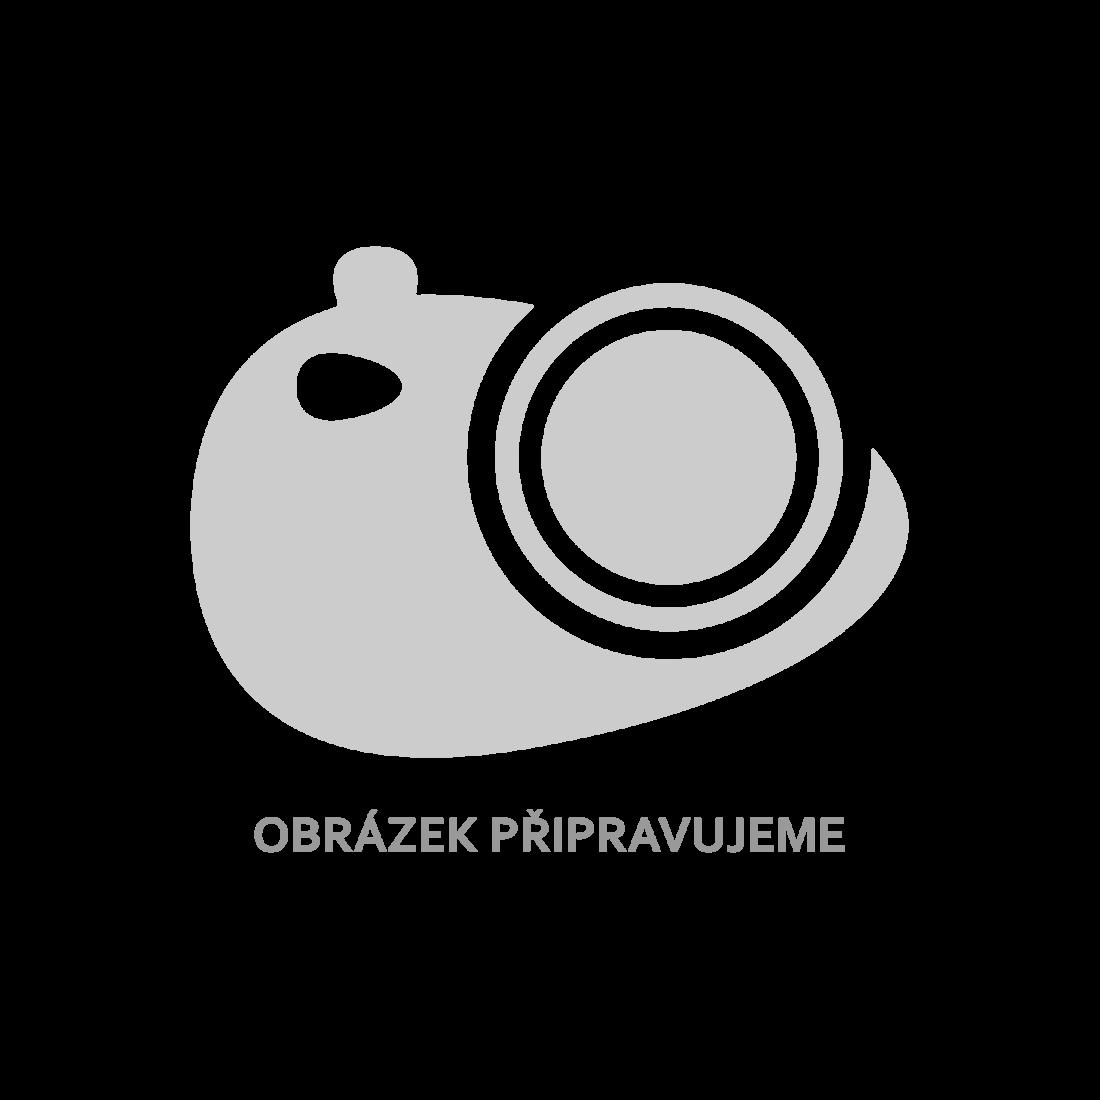 Potahy na stůl bílé, 80 cm, s mašlí, 2 ks